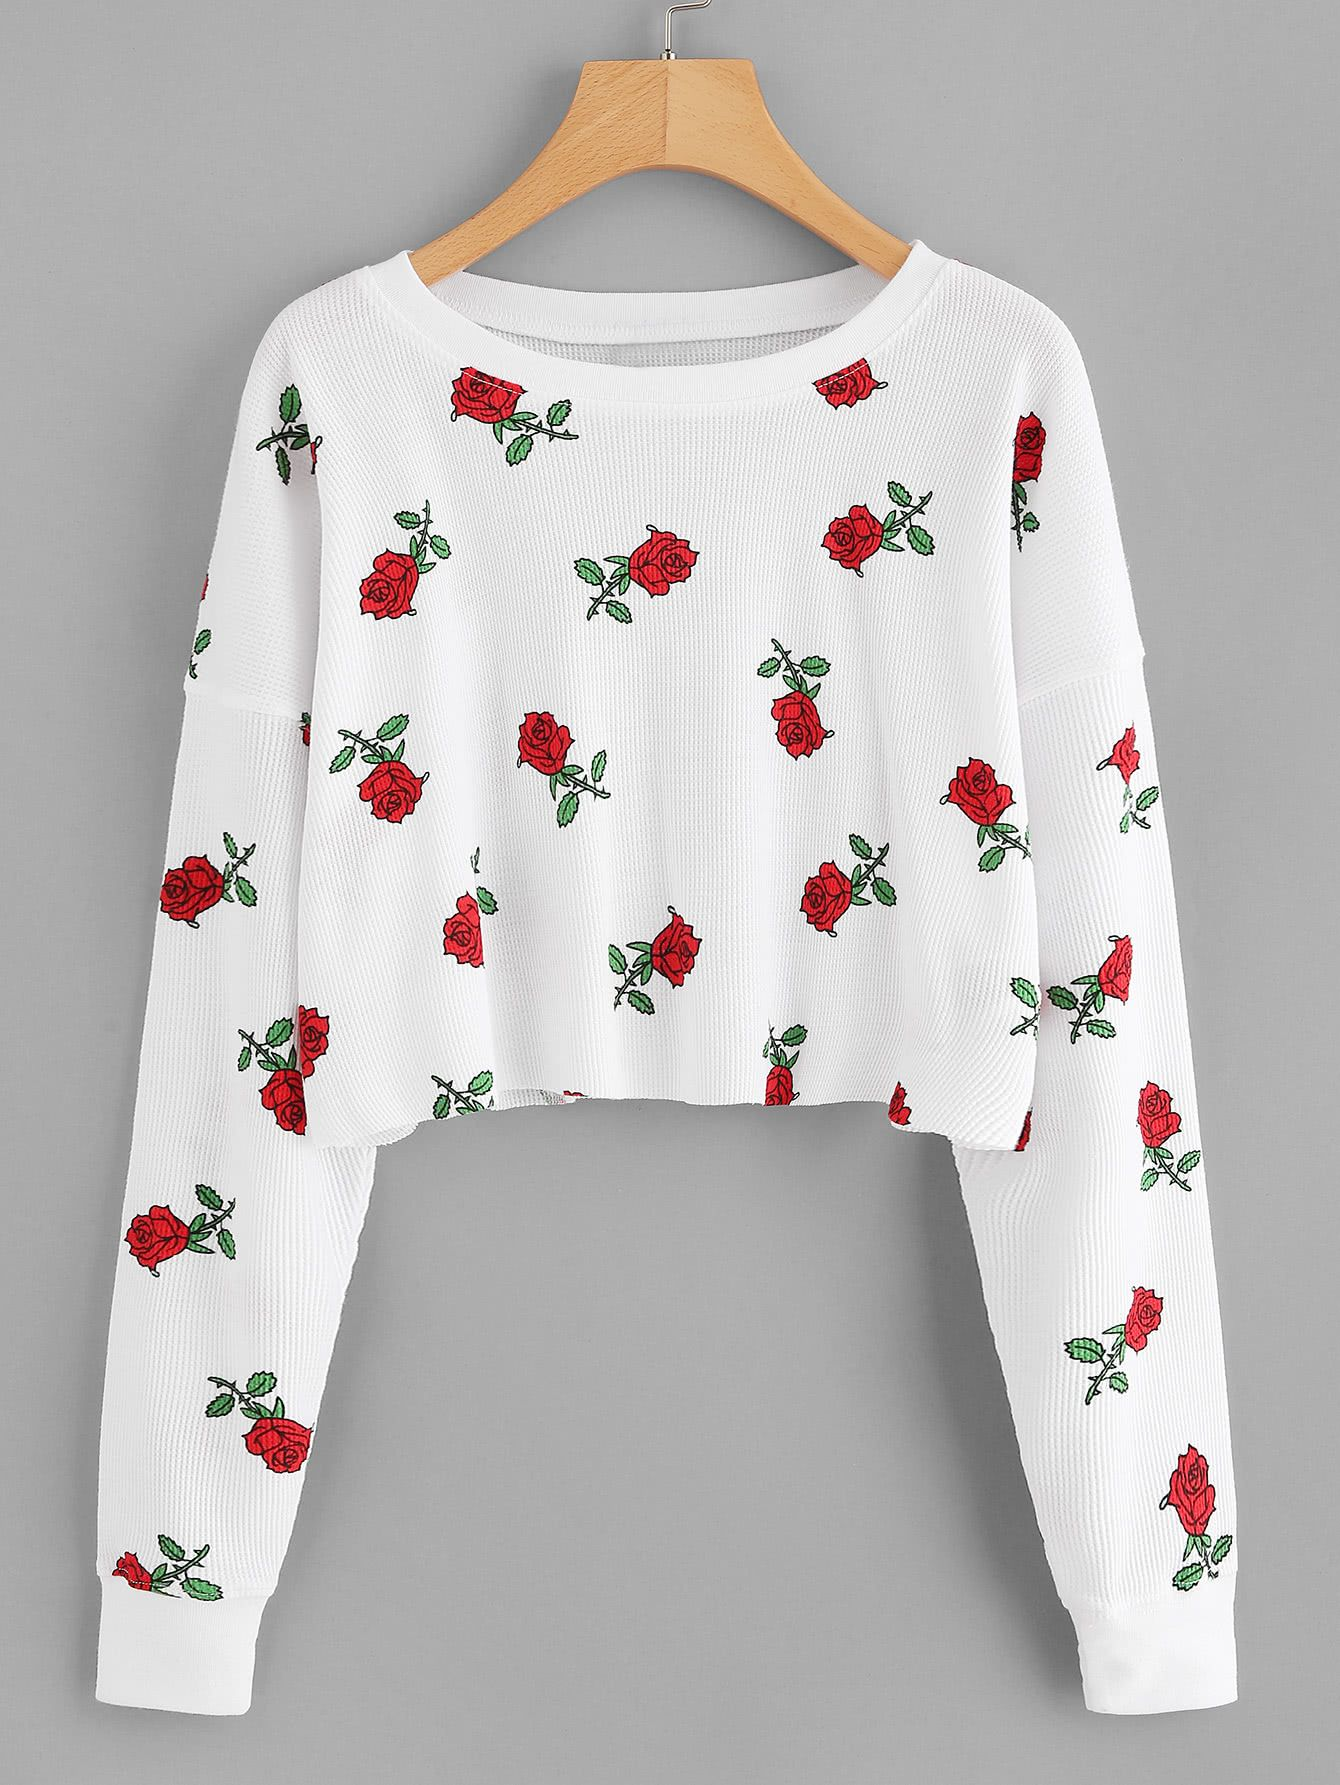 ccc5817fbe501 Rose Print Raw Hem Crop T-shirtFor Women-romwe